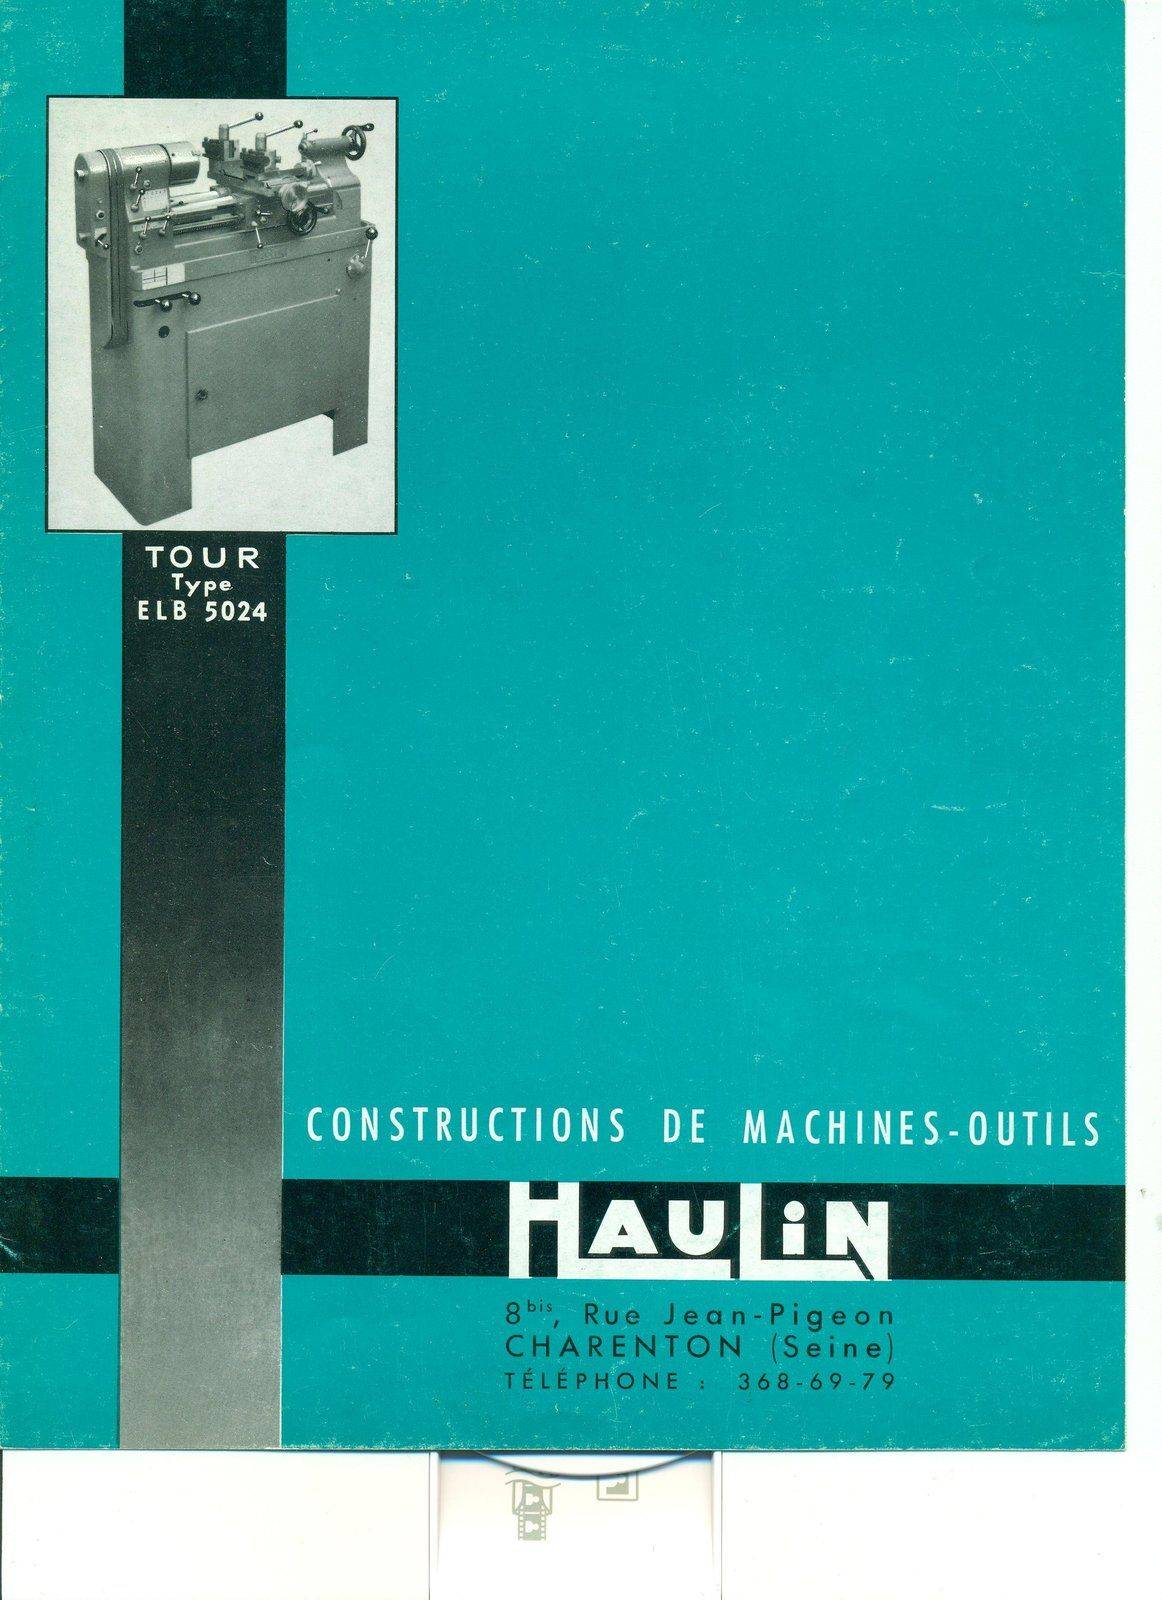 Pub Haulin 1 001.jpg